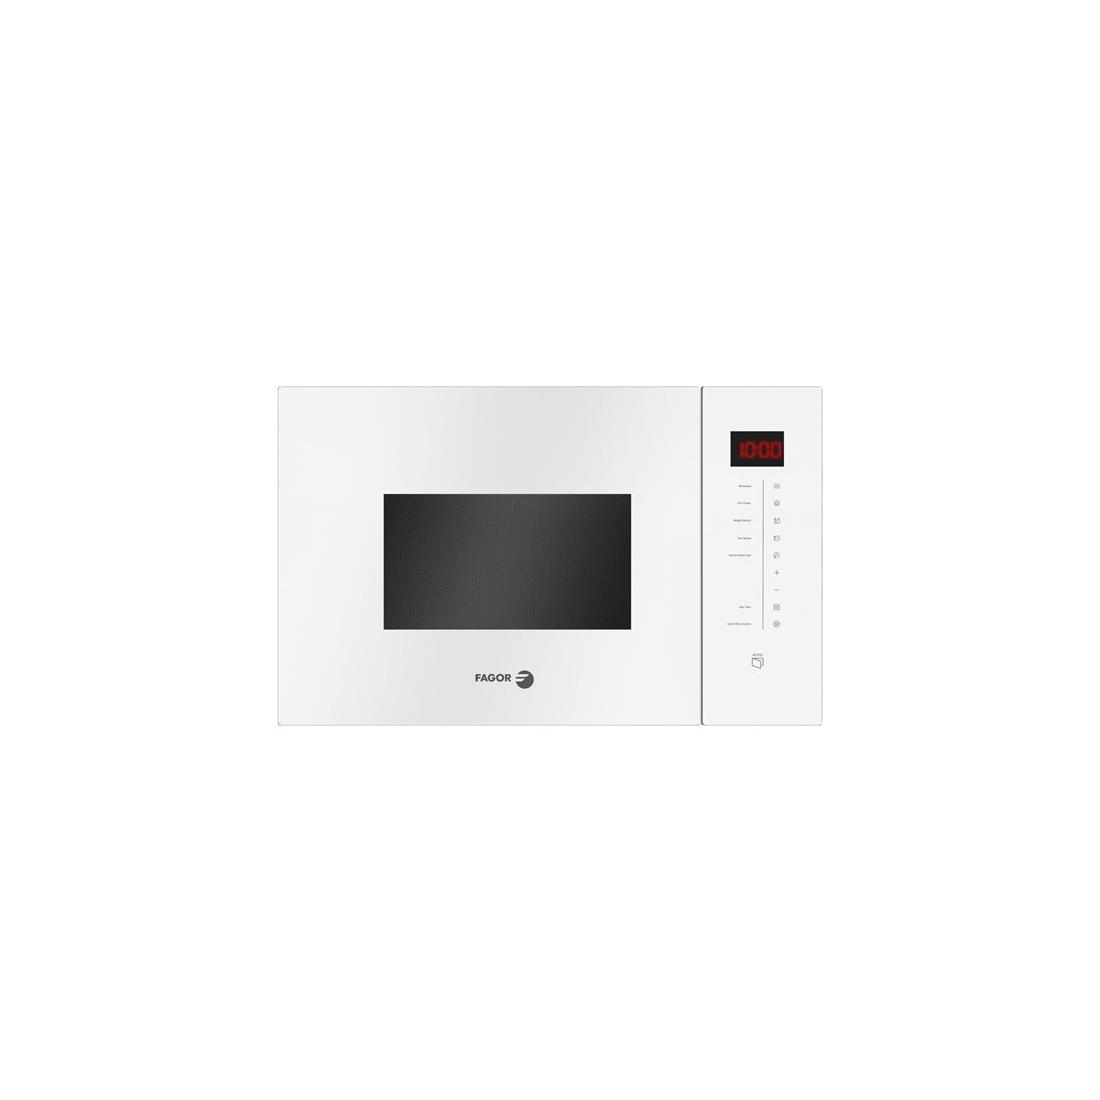 Microondas Integrable - Fagor 3MWB-25BTCGB, Blanco